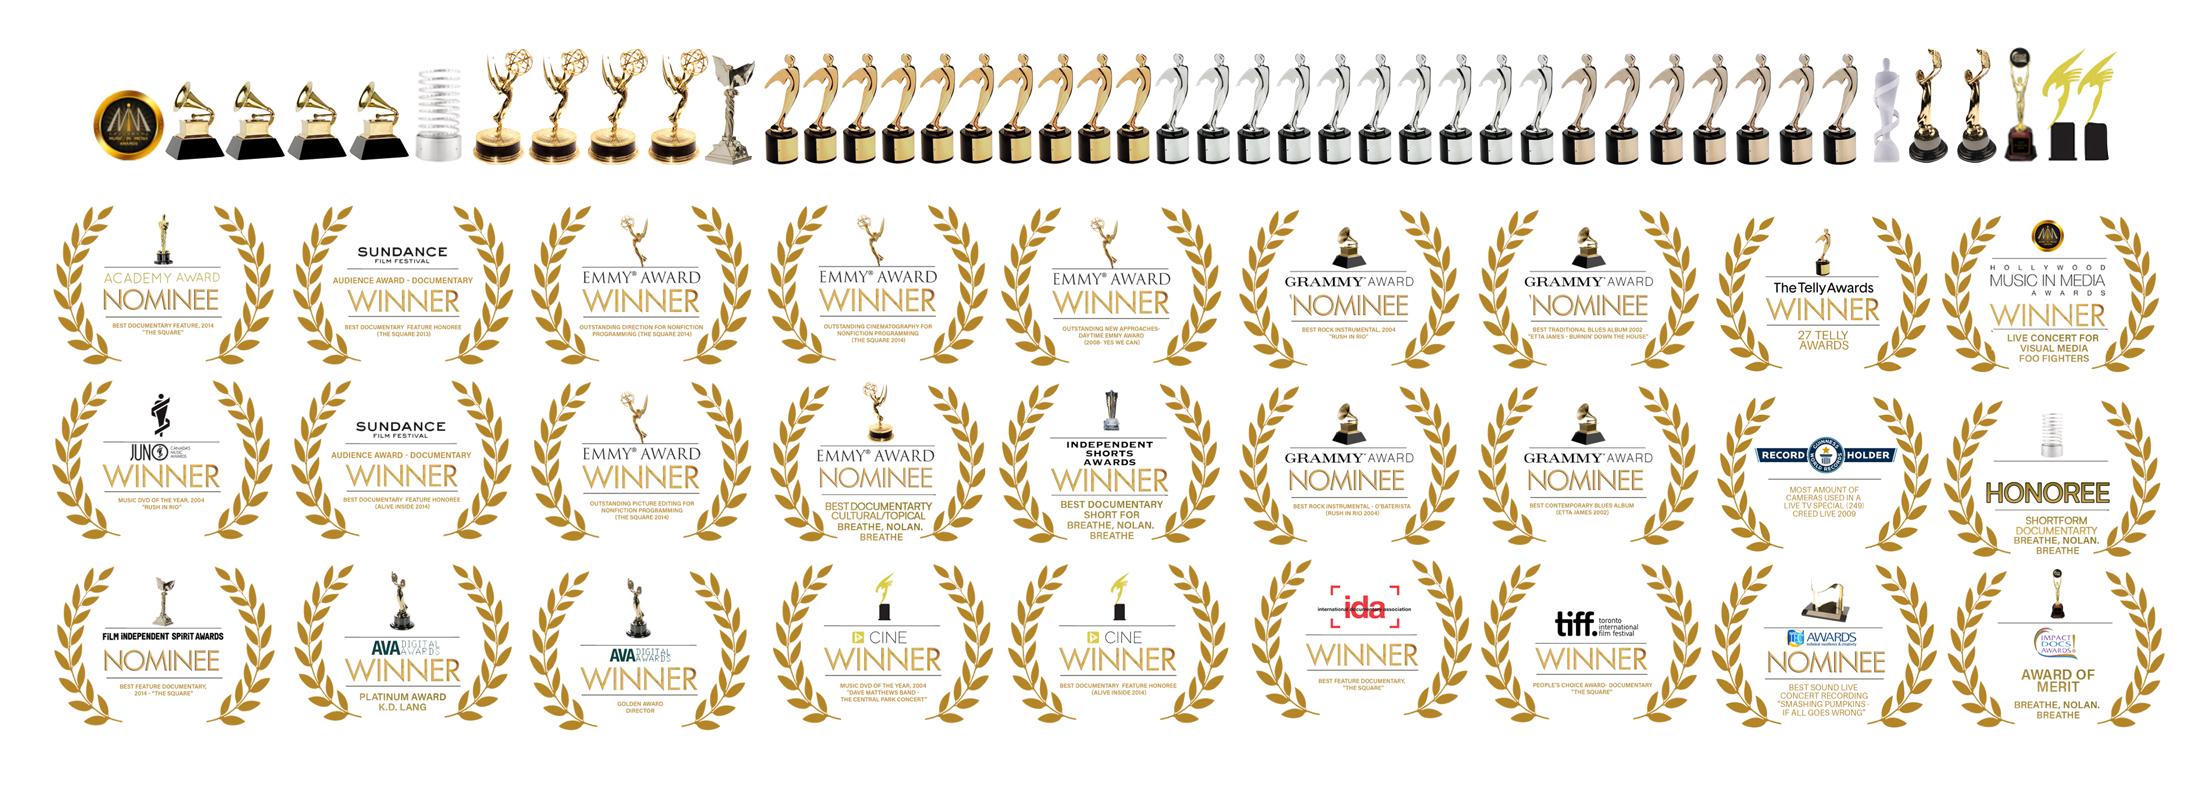 CDS-Awards-August-2020